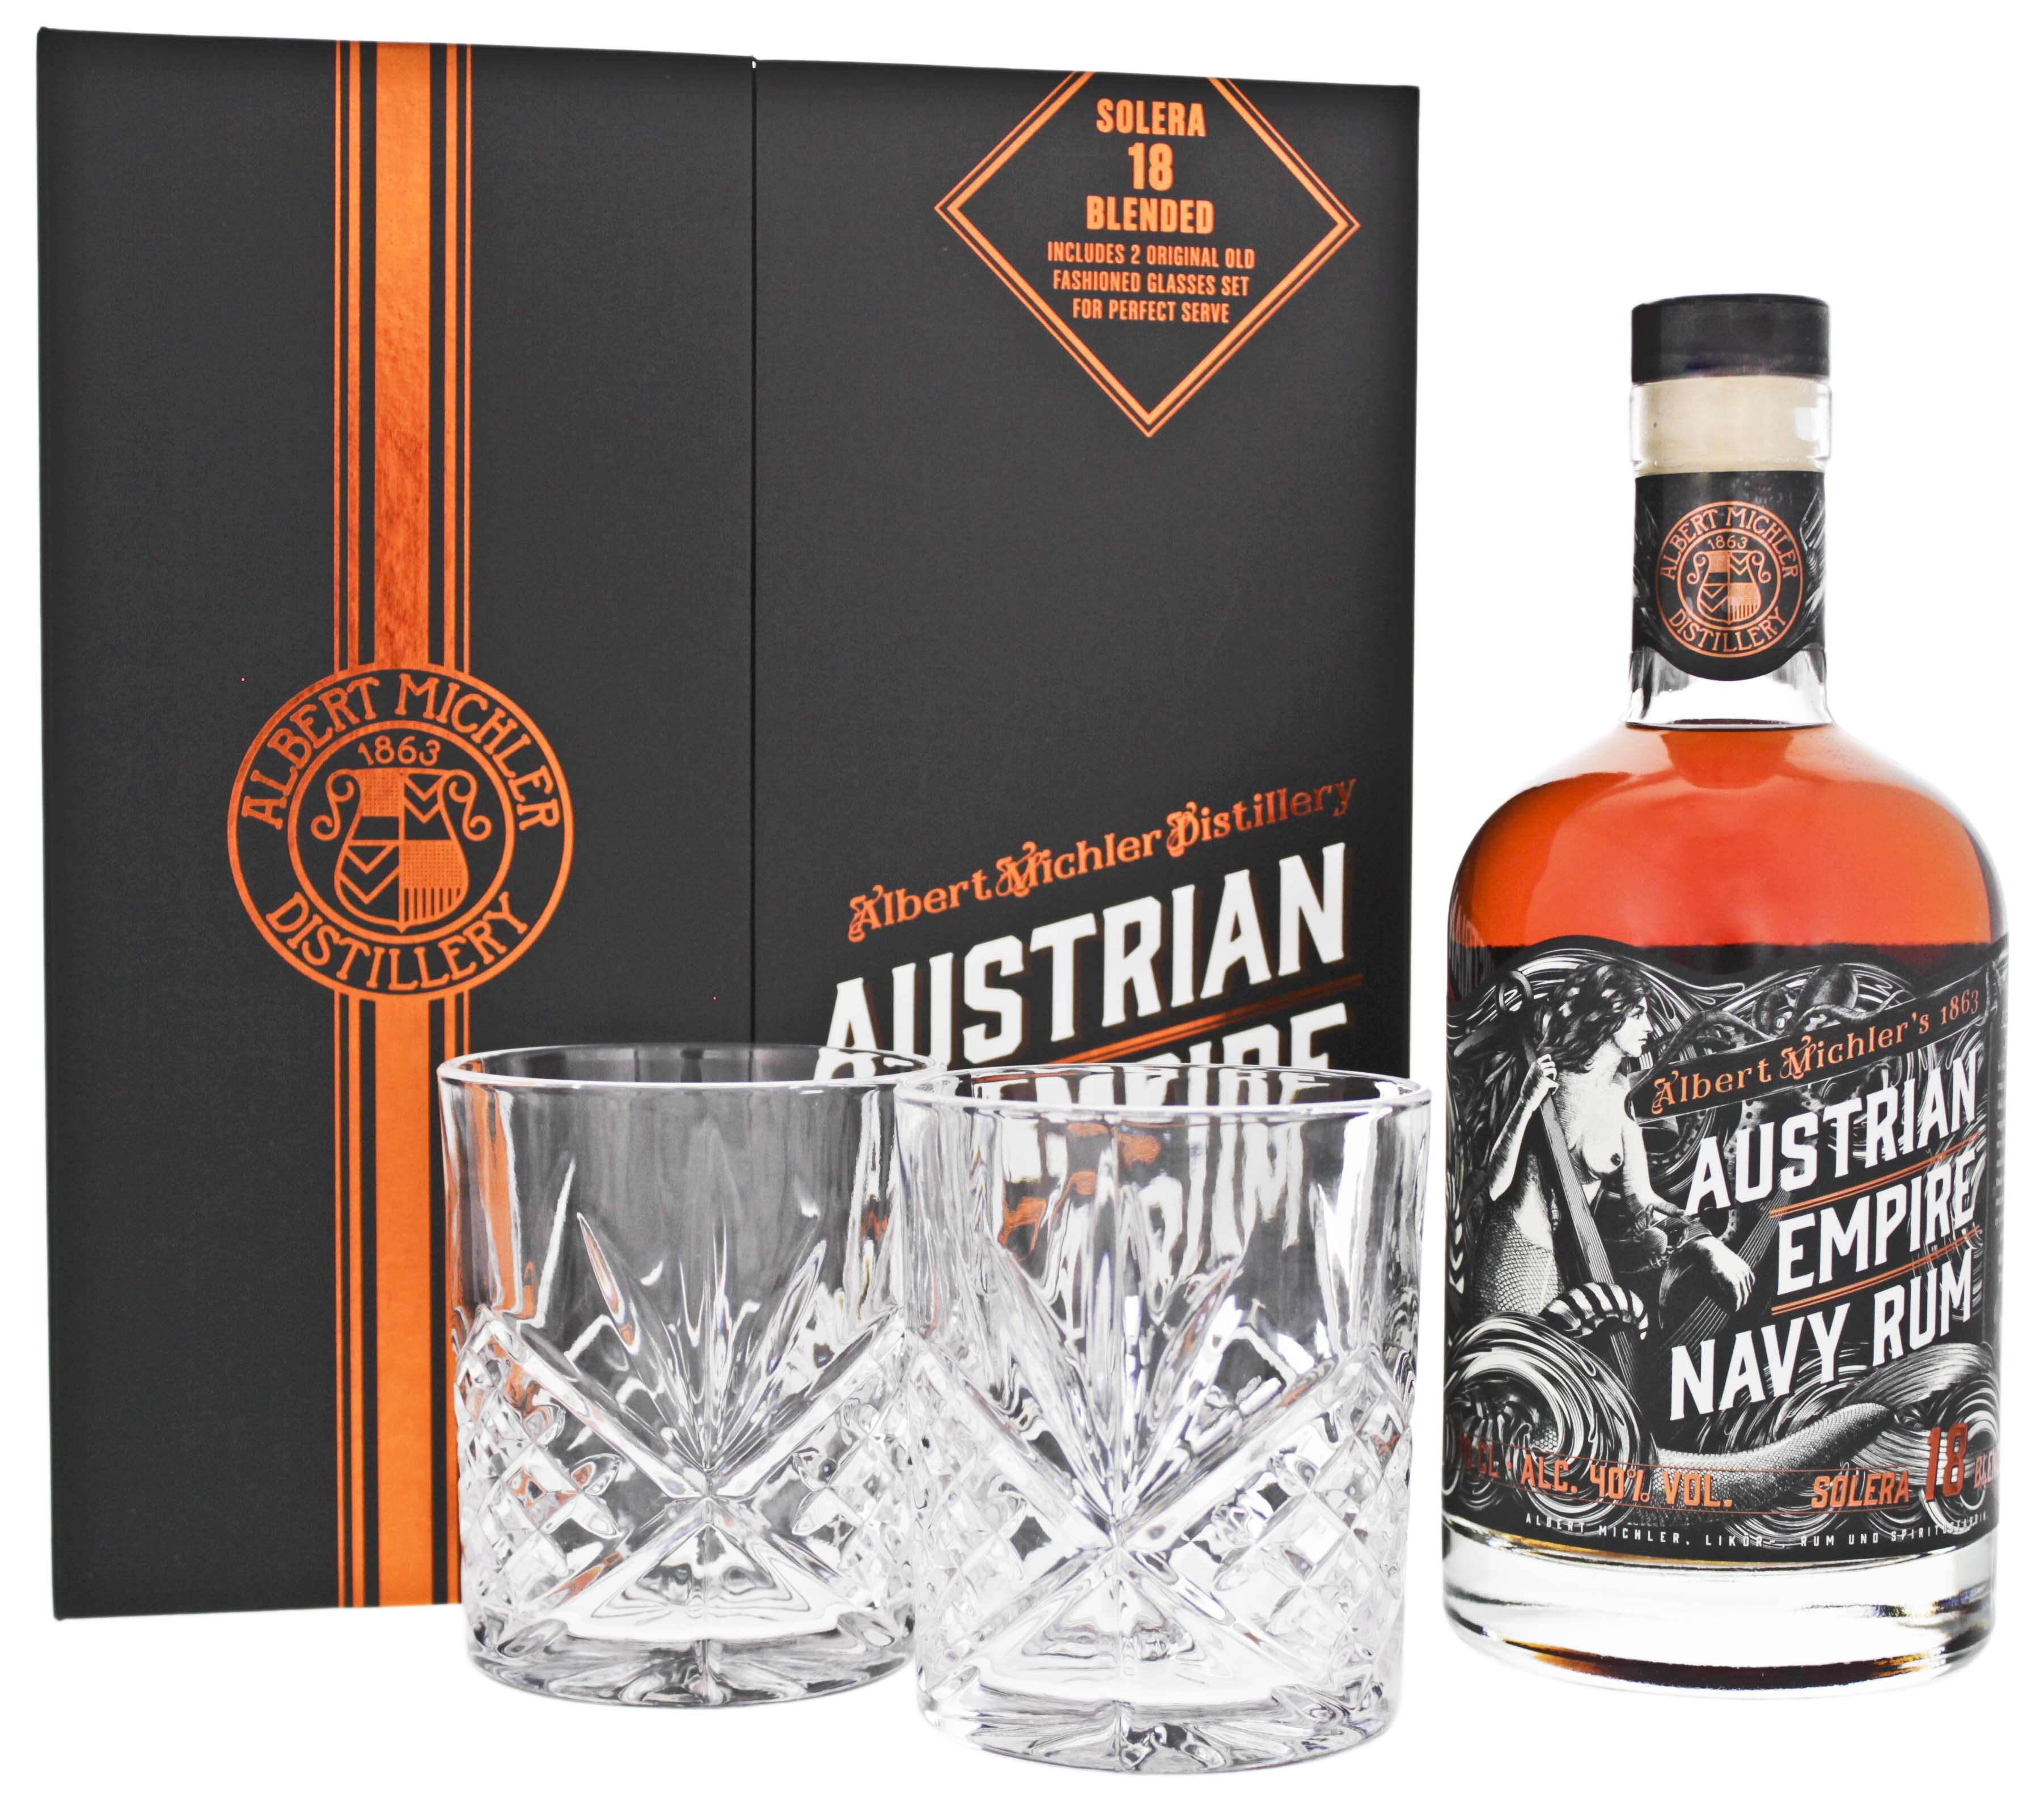 Austrian Empire Navy Rum Solera 18YO 0,7L + 2 Gläser (Old Fashioned)